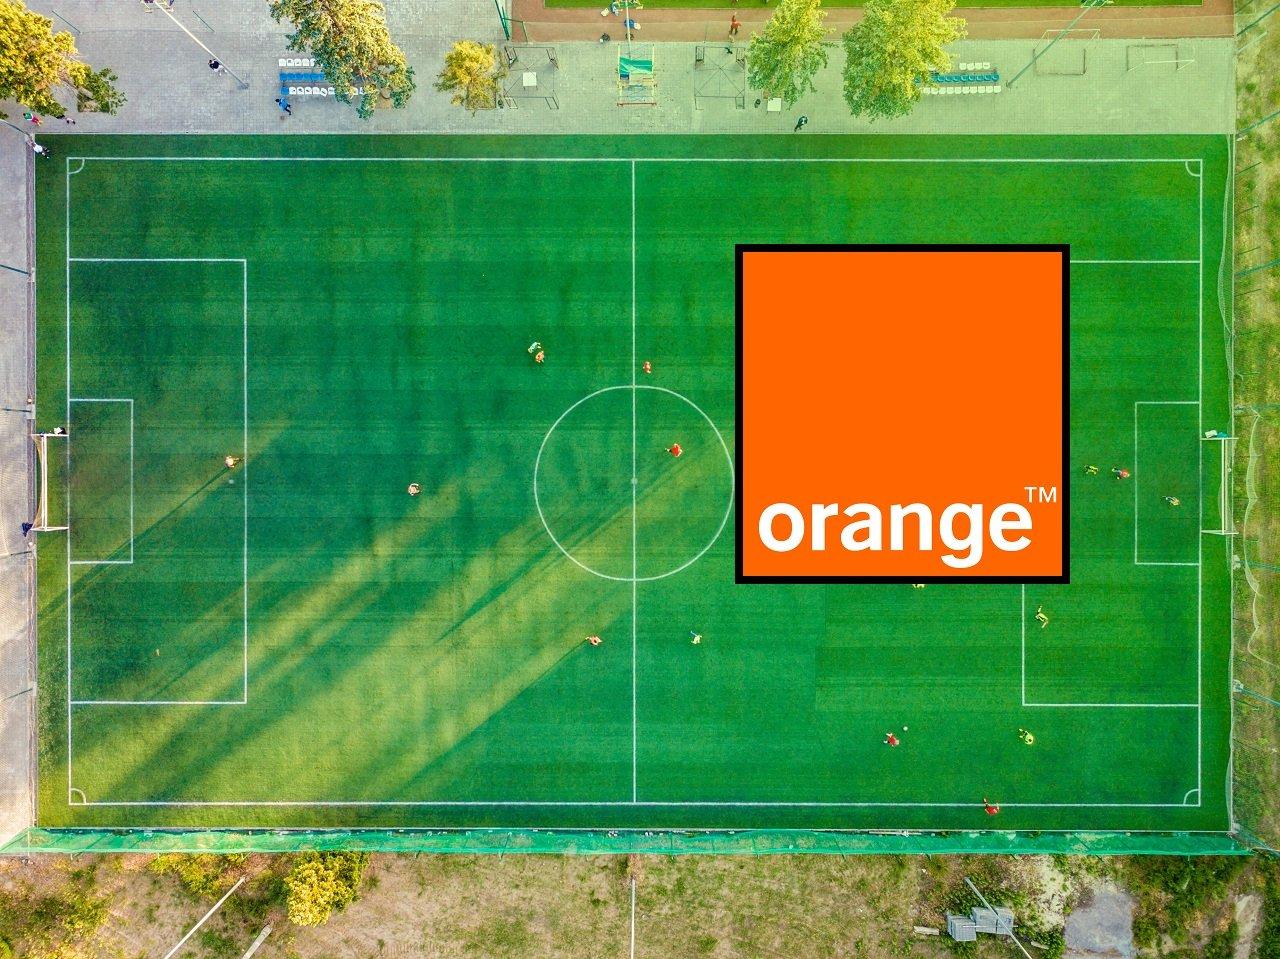 Orange 3 GB after the match